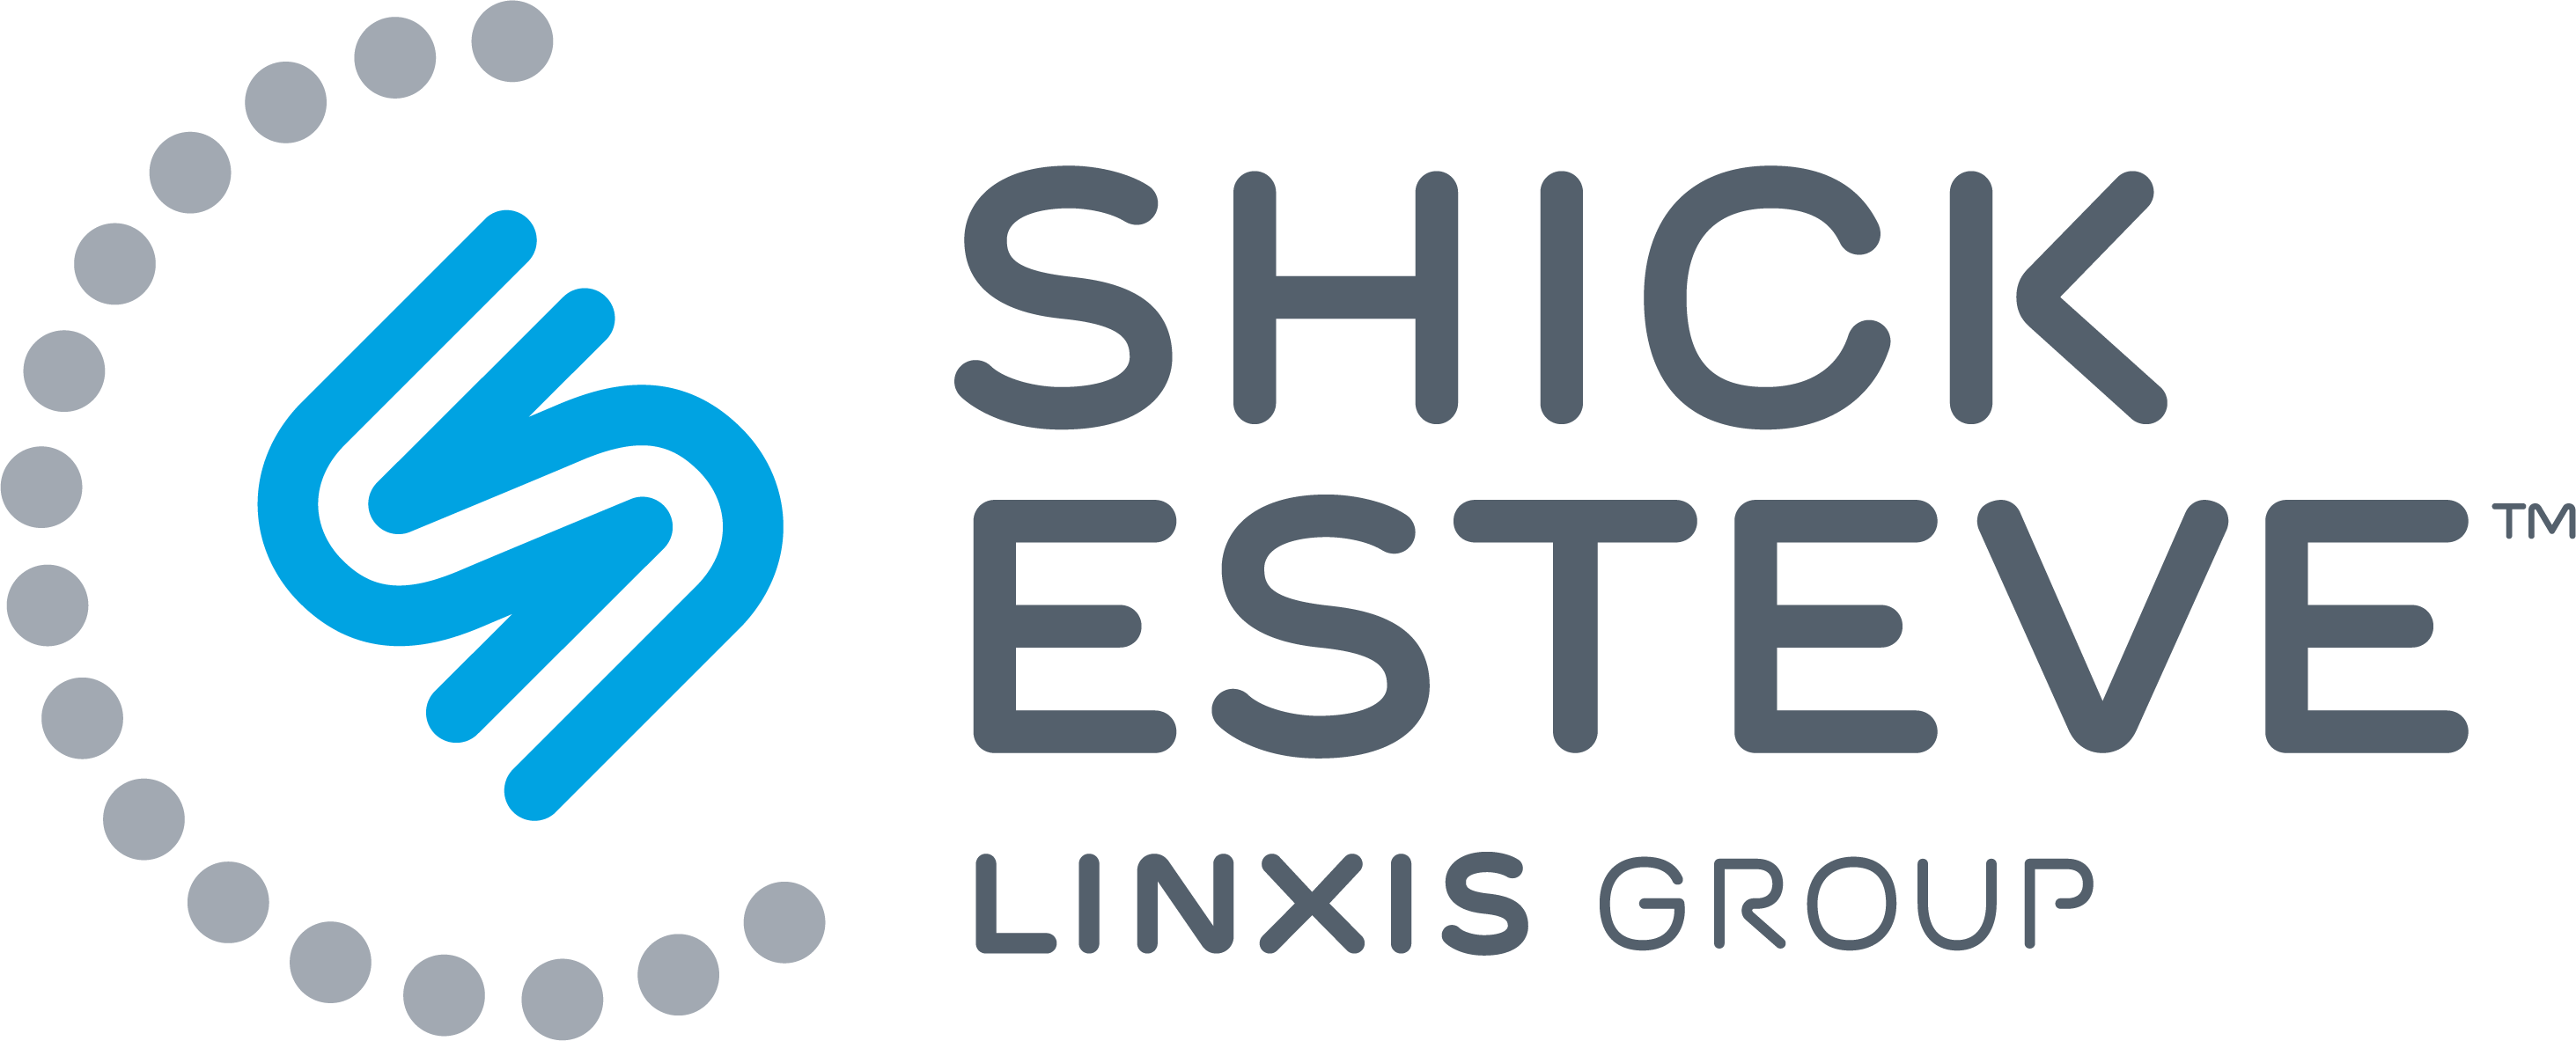 Shickesteve Logo